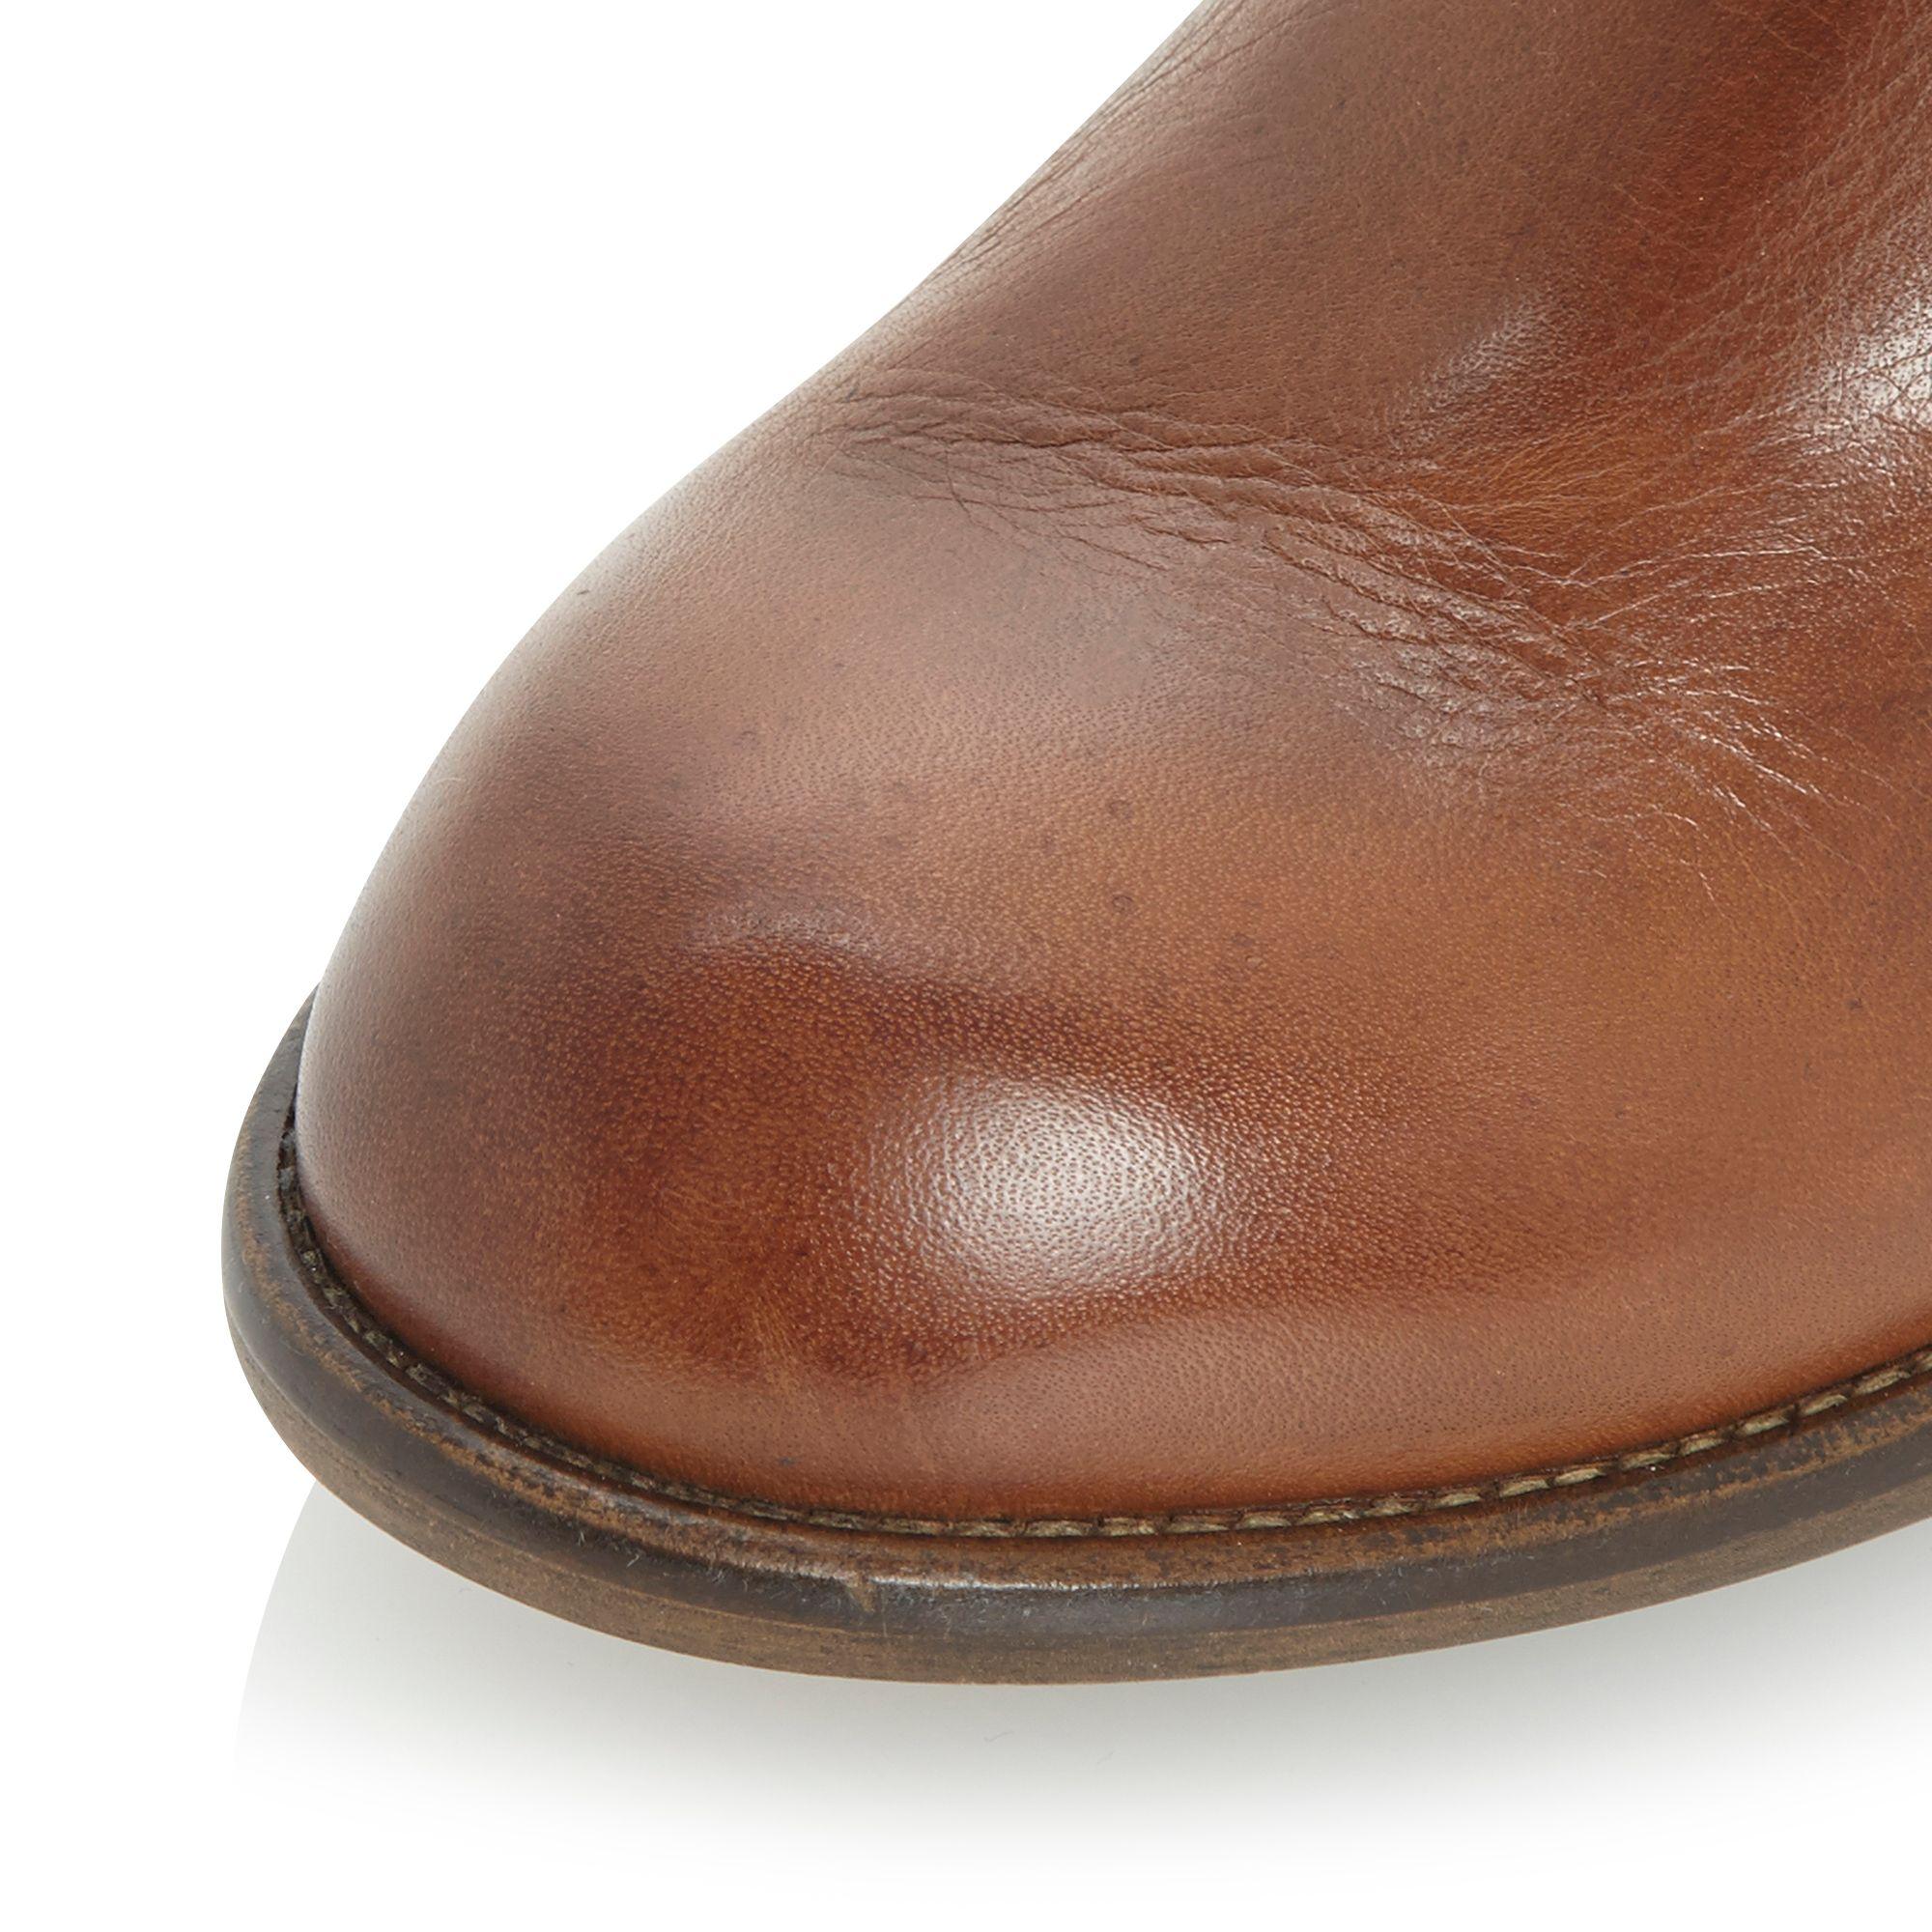 Dune Pash Diagonal Side Zip Boots in Tan (Brown)